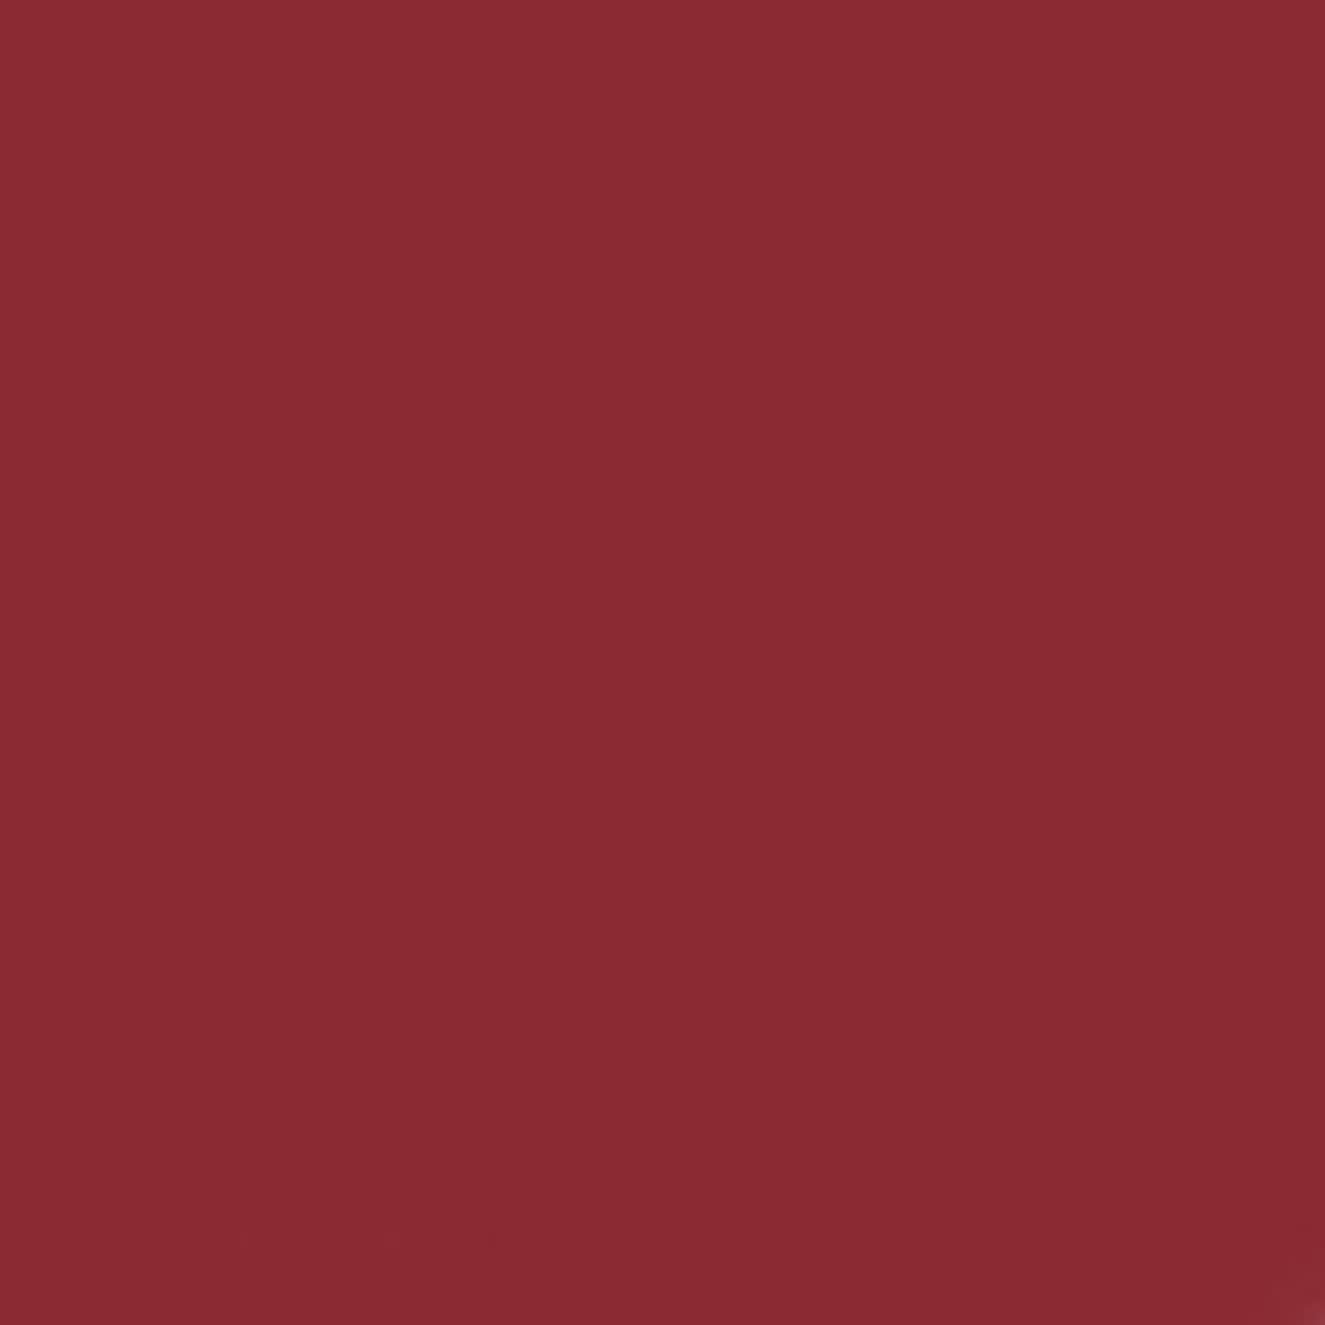 Efco Wax Sheet, Old Red, 200 x 100 x 0.5 mm, 2-Piece